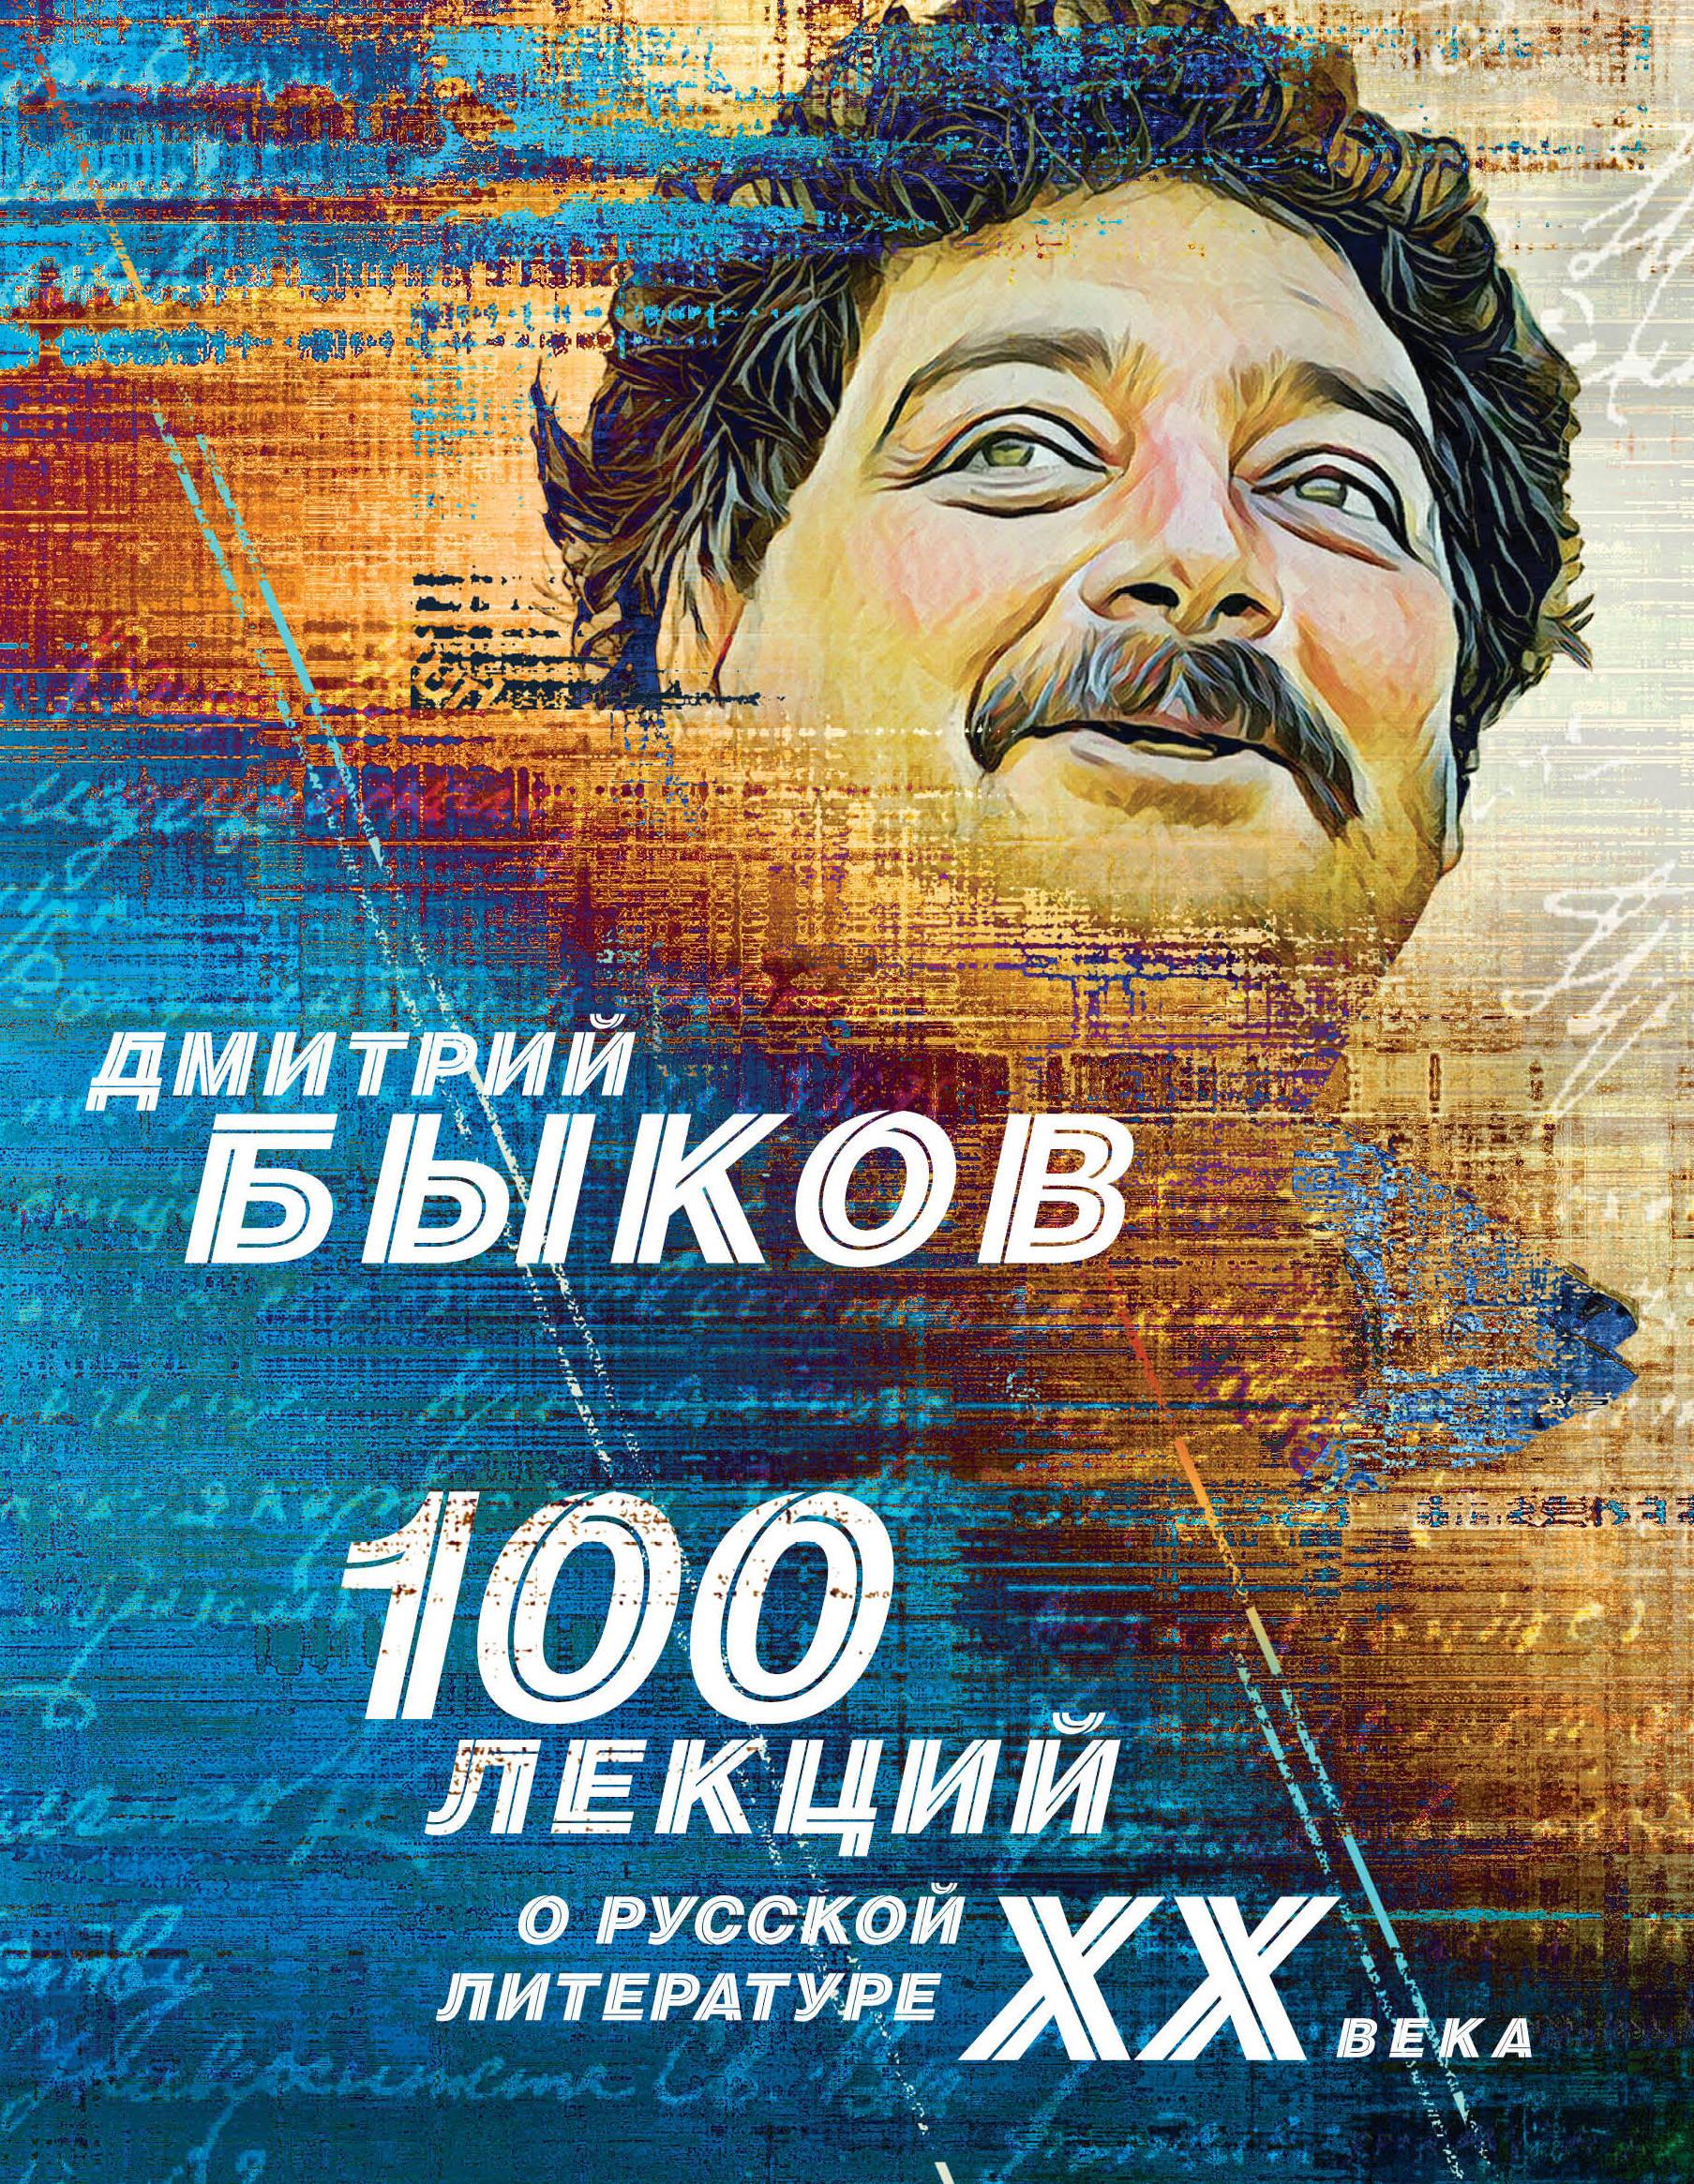 100 лекций о русской литературе XX века